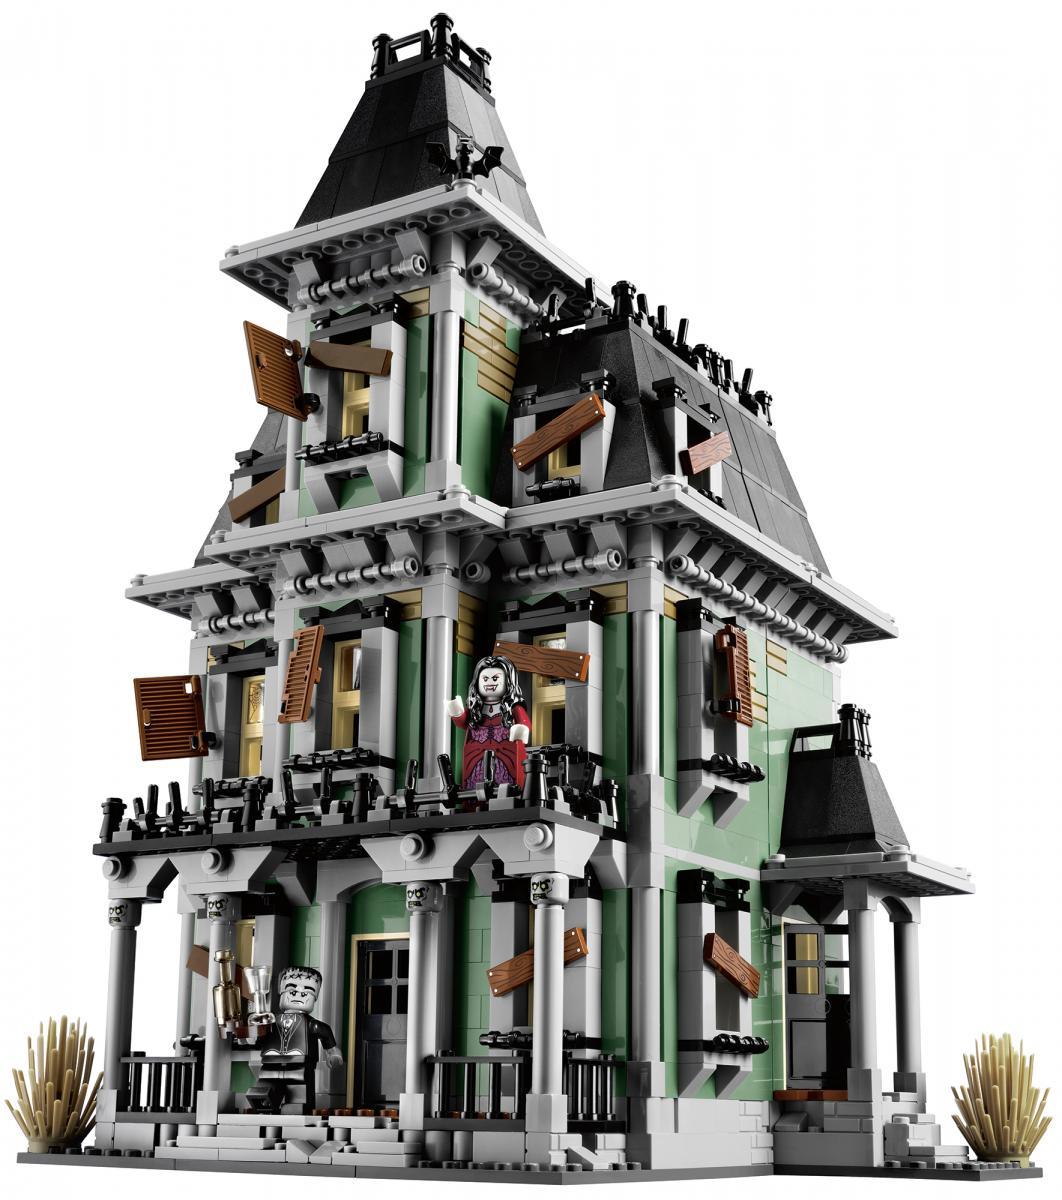 LEGO gosSIP: 100612 LEGO 10228 Haunted House box art and ...